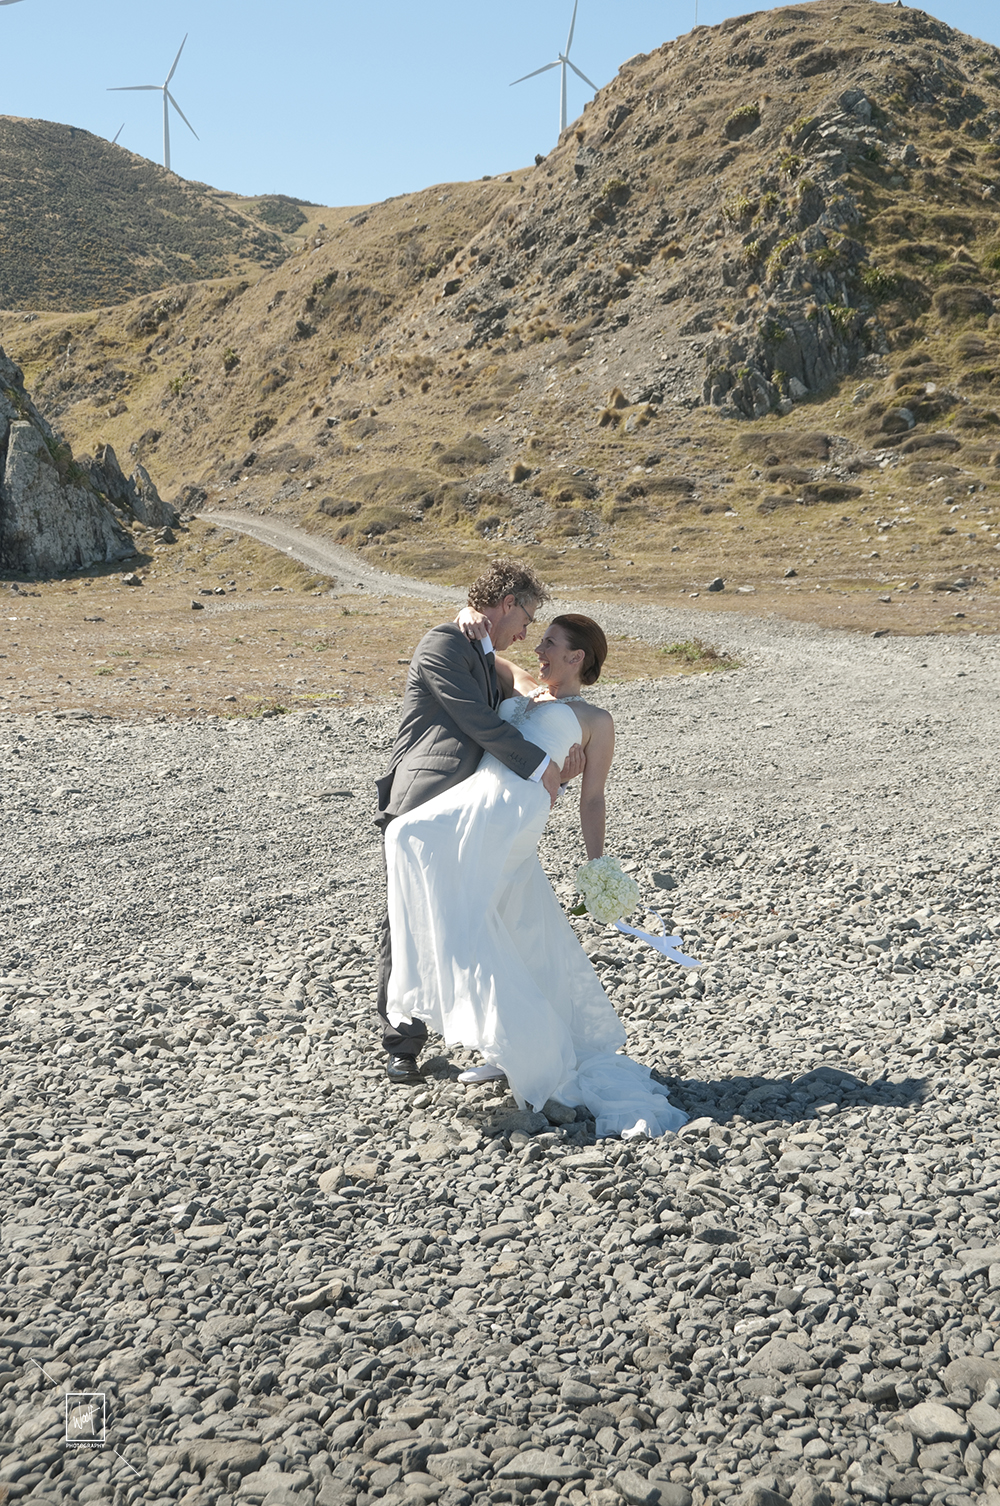 Wedding photos at the beach